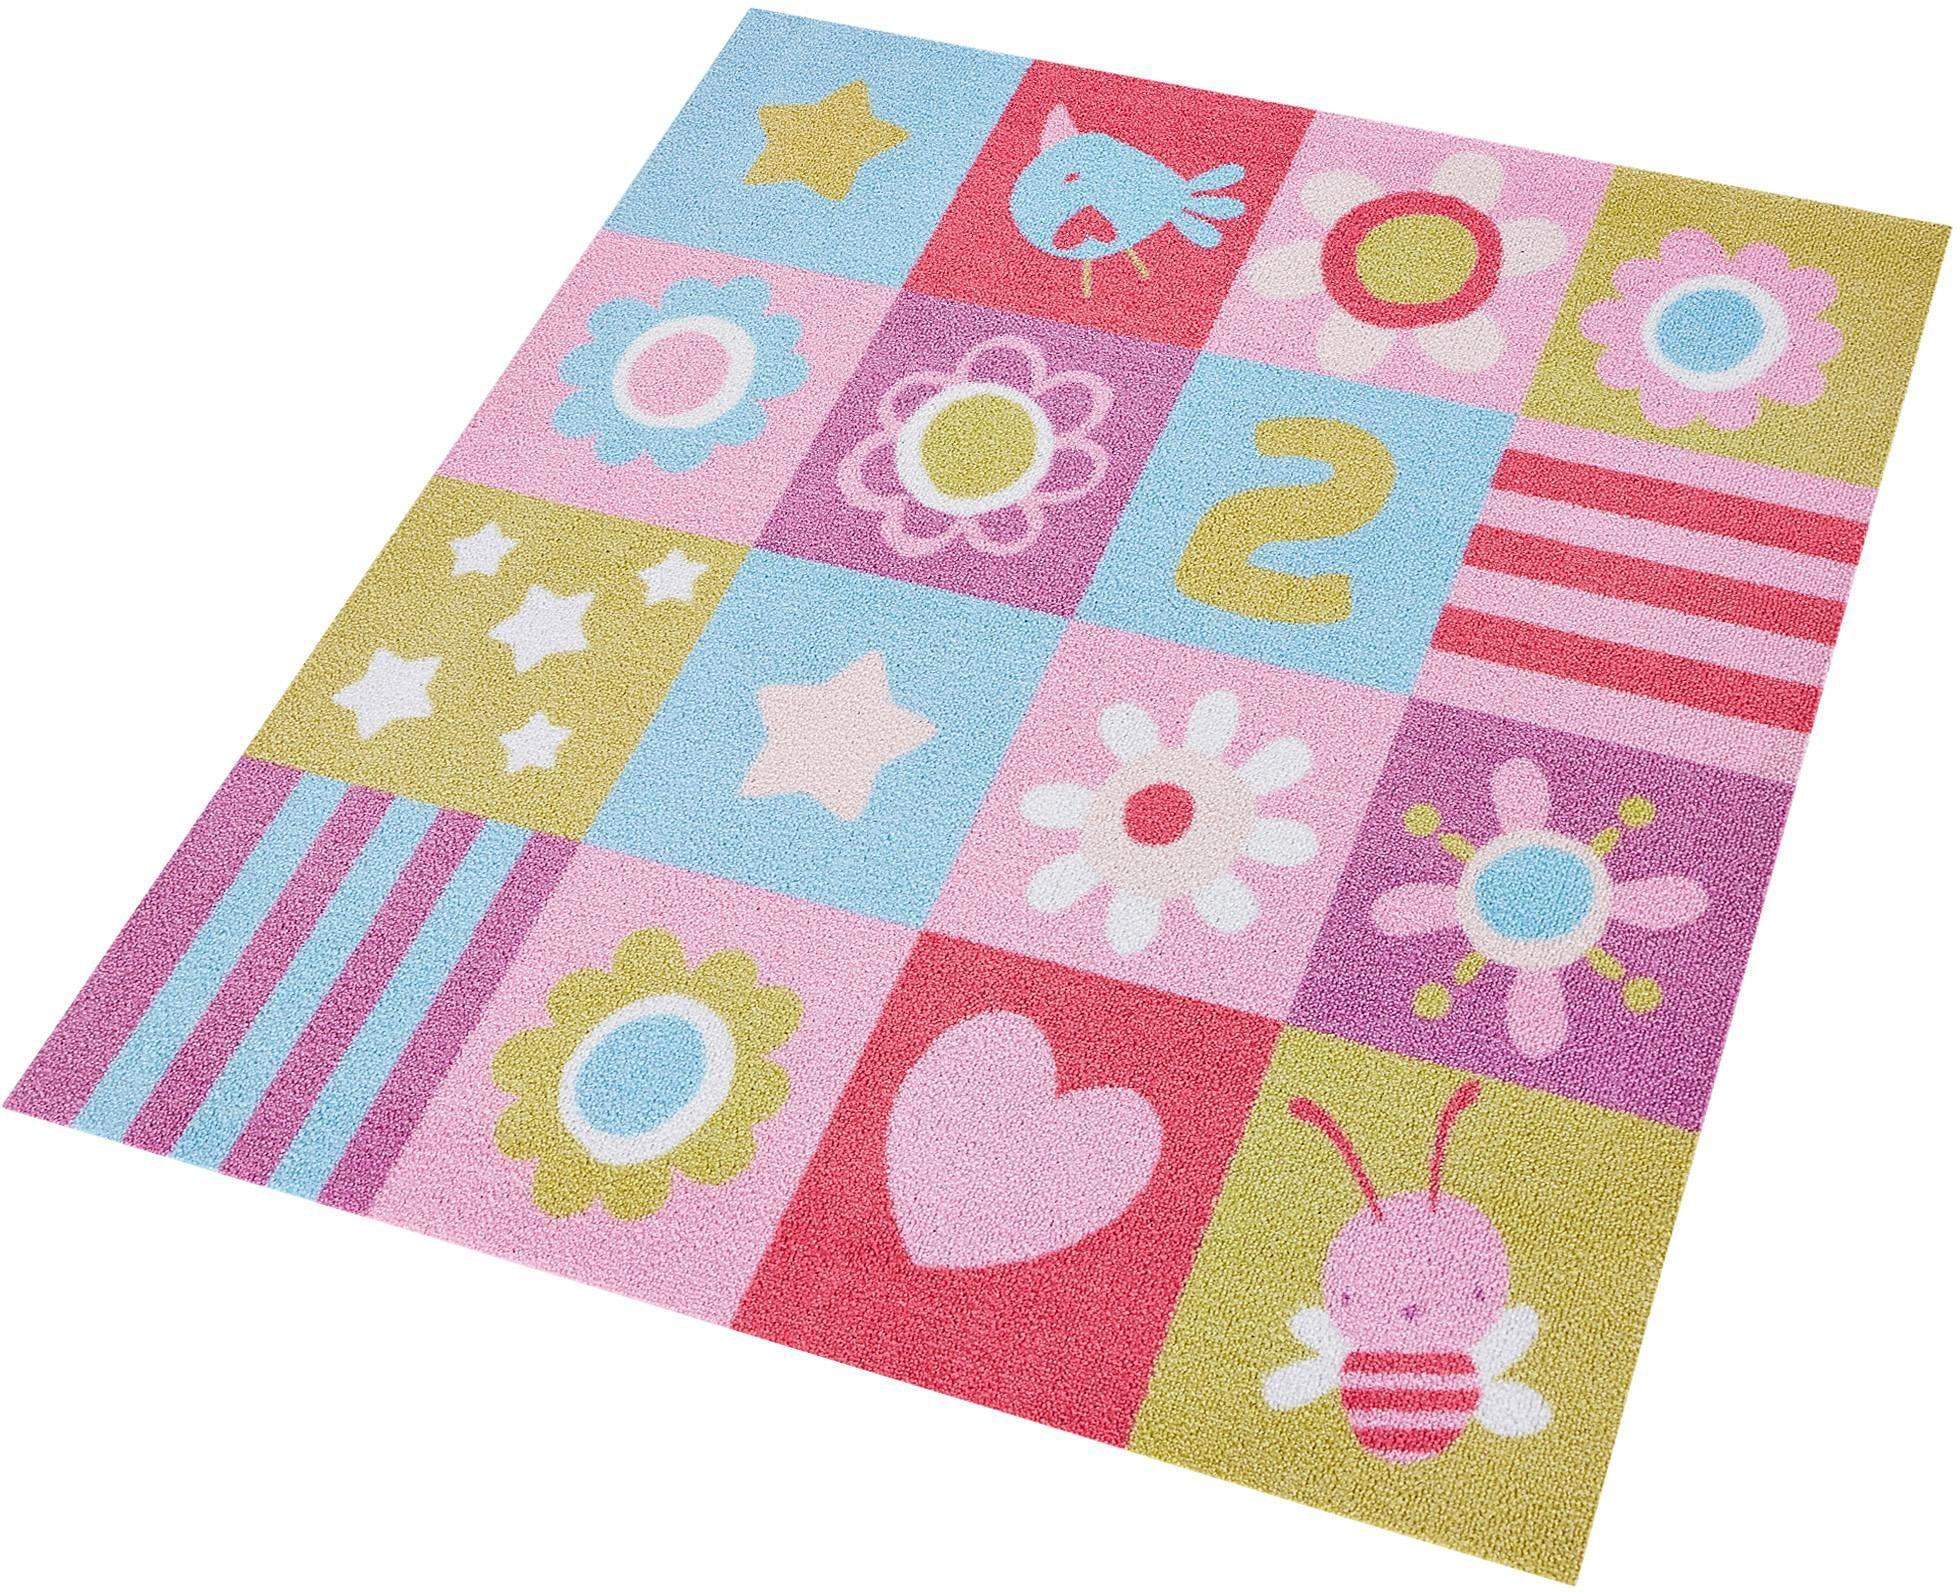 Kinderteppich »Flower Patchwork«, Zala Living, quadratisch, Höhe 7 mm